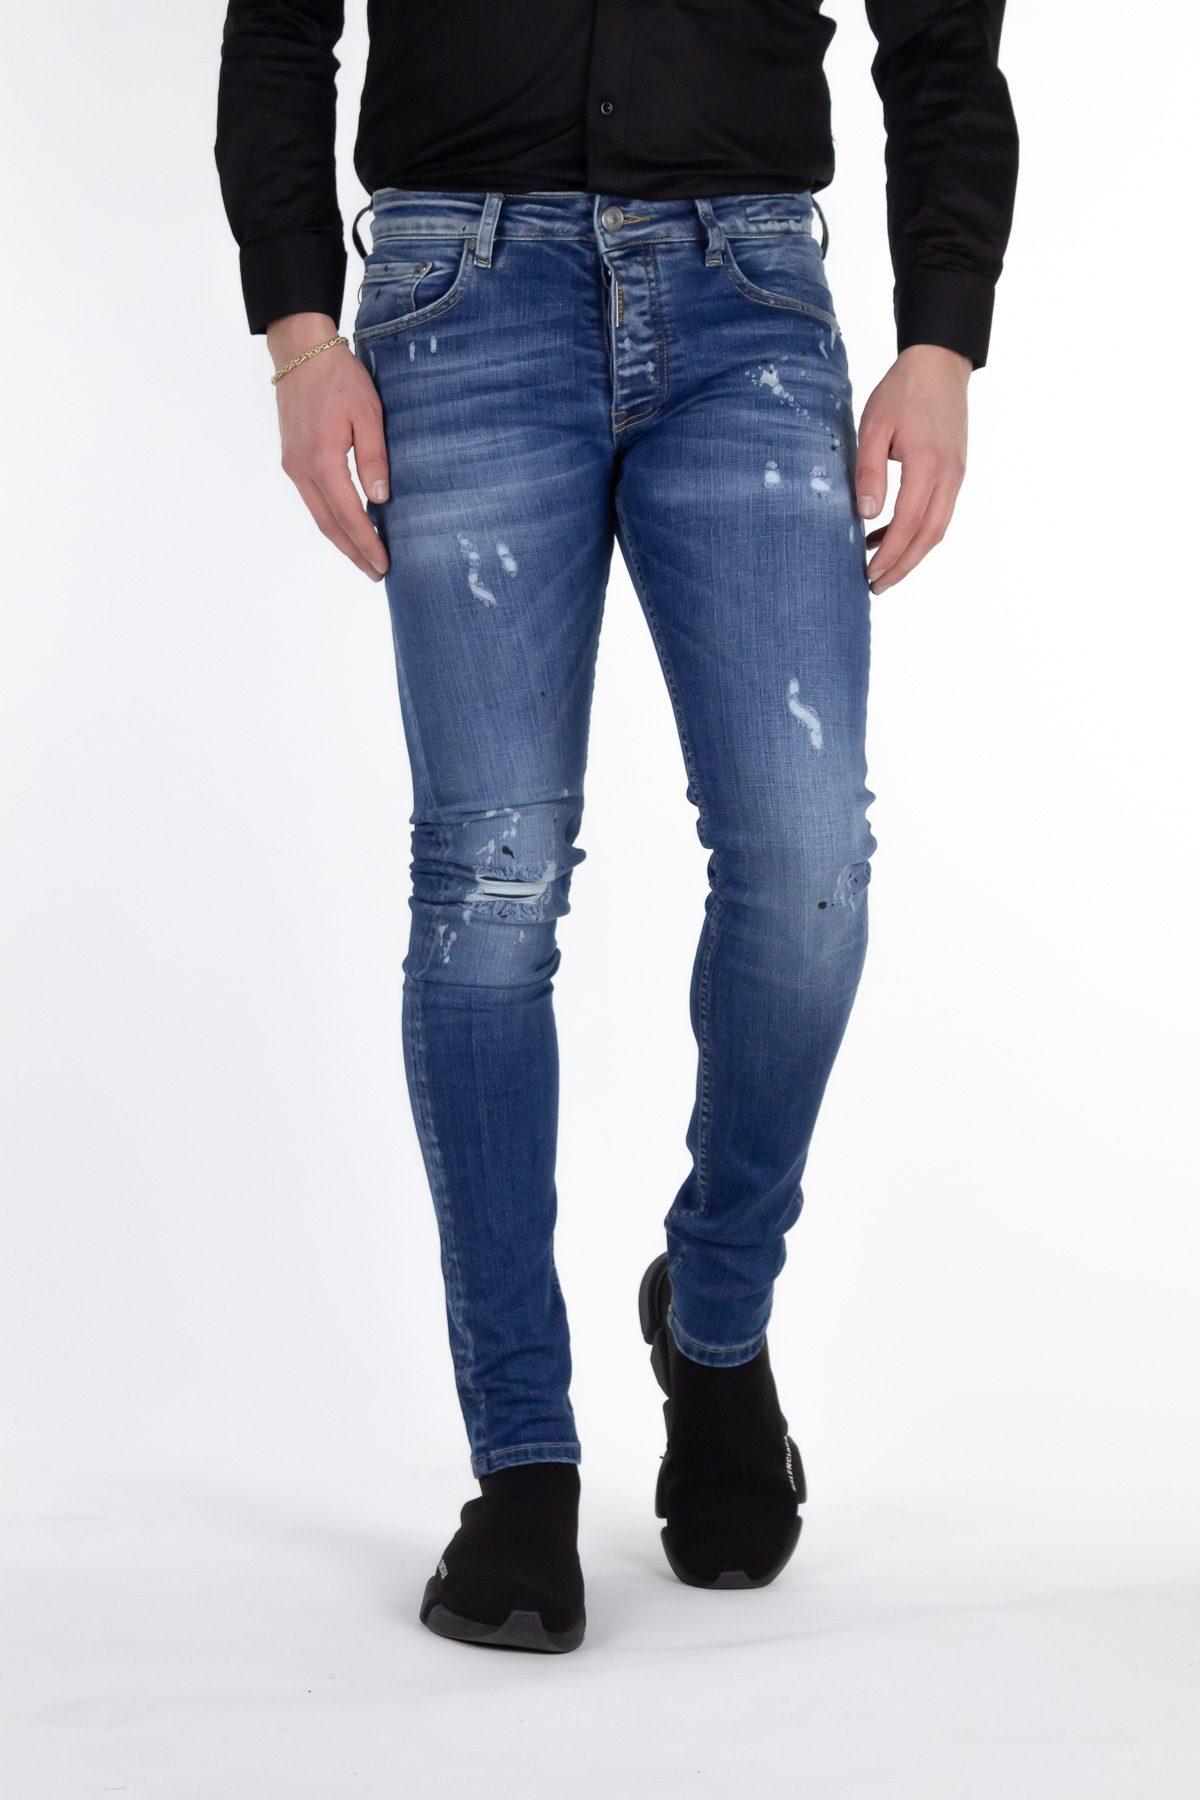 Richesse Milan Blue Jeans 2237-1